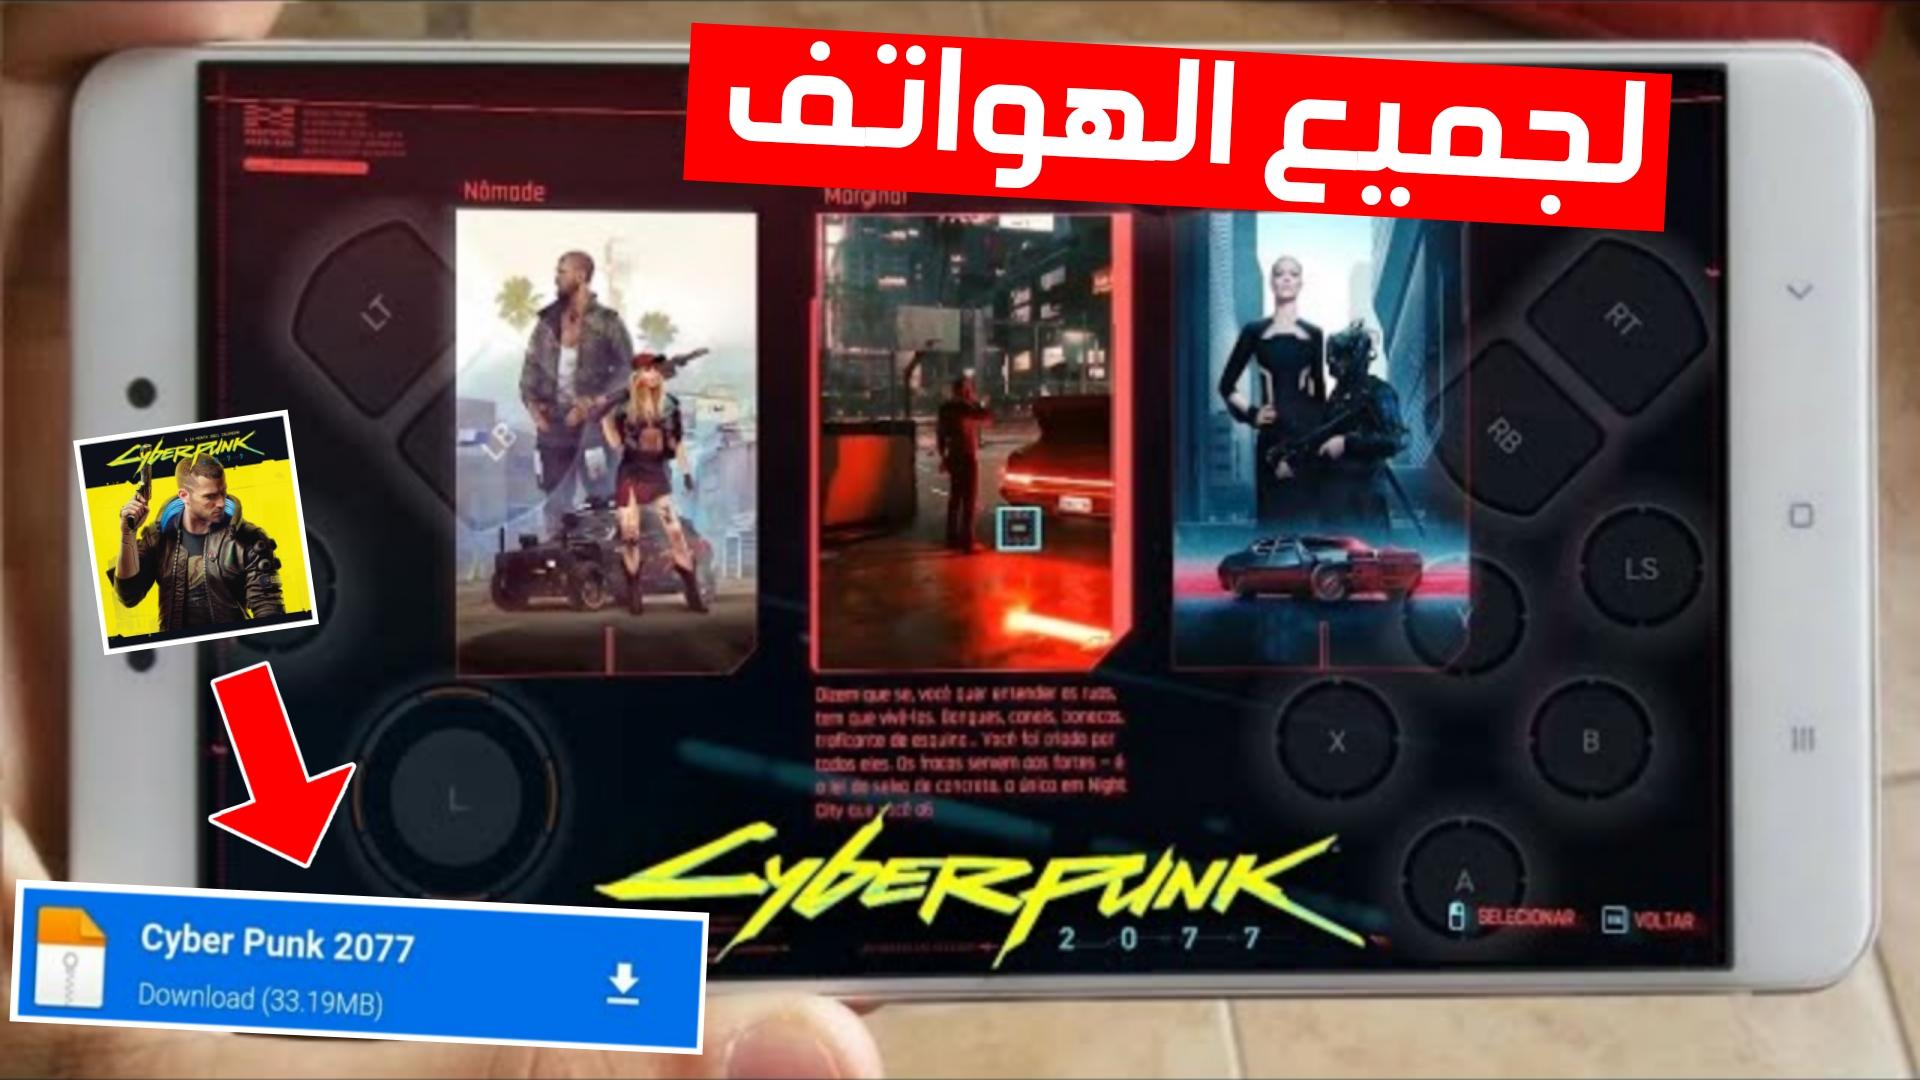 رسميا تحميل لعبة Cyberpunk 2077 للاندرويد والايفون من ميديافاير برابط مباشر | Cyberpunk 2077 Mobile